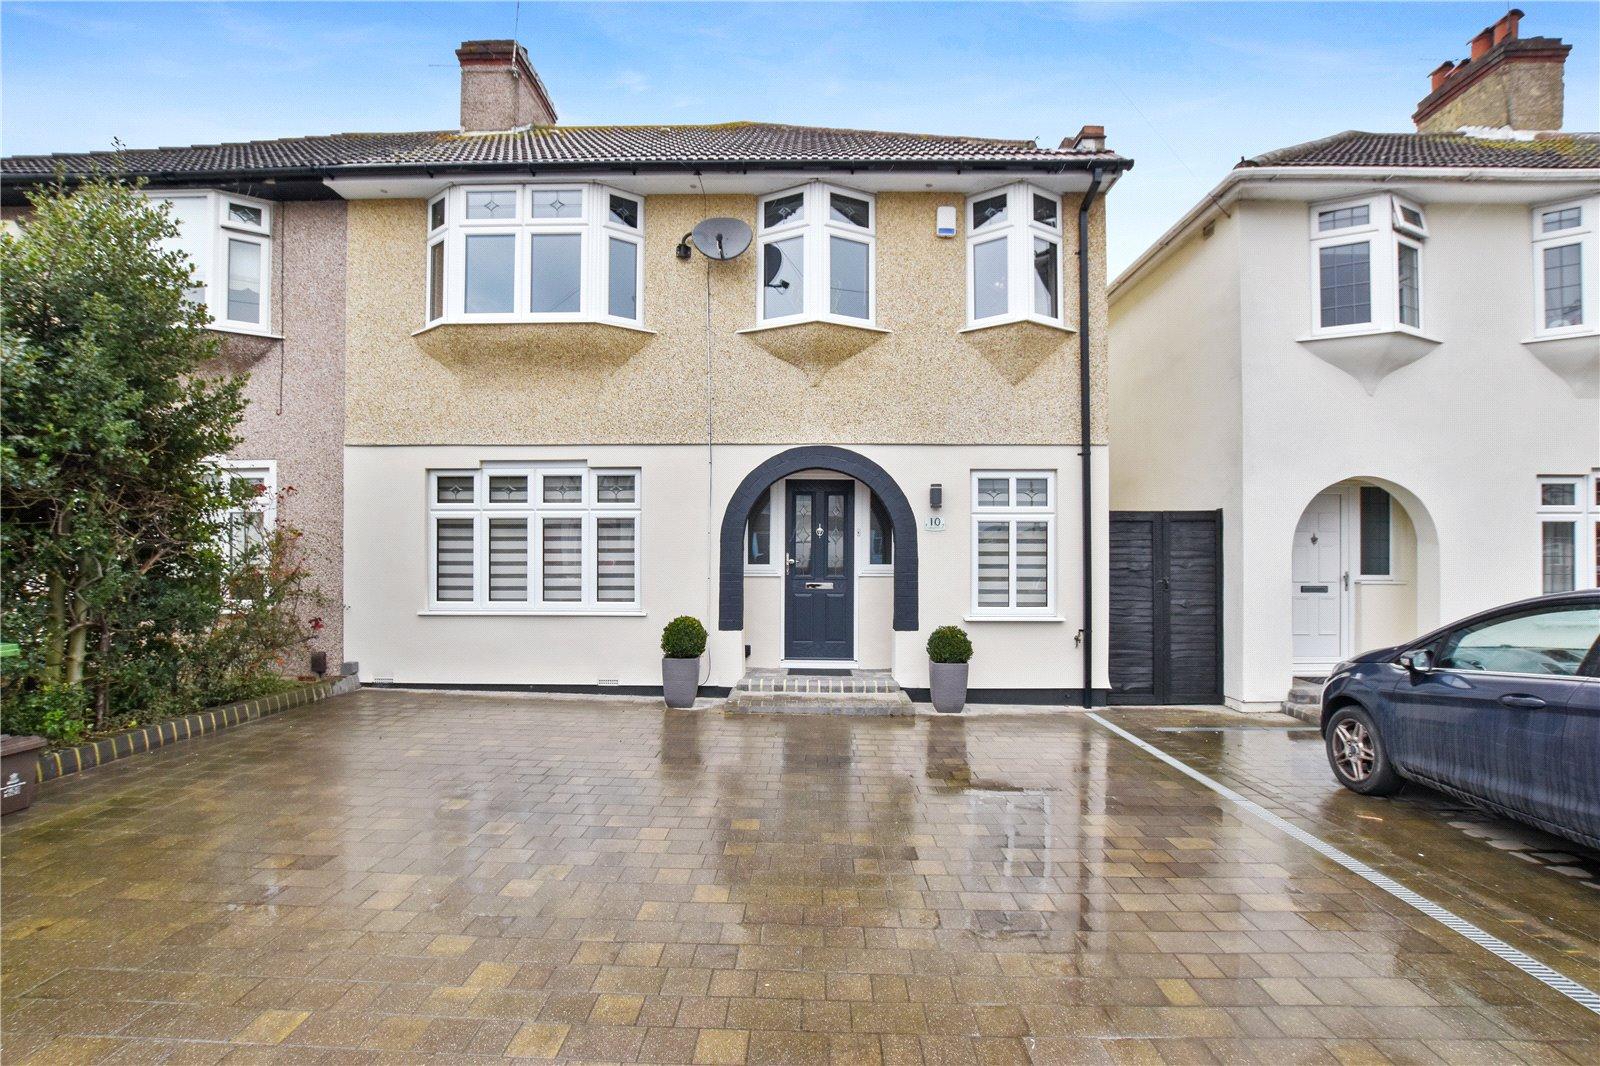 Chessington Avenue, Bexleyheath, Kent, DA7